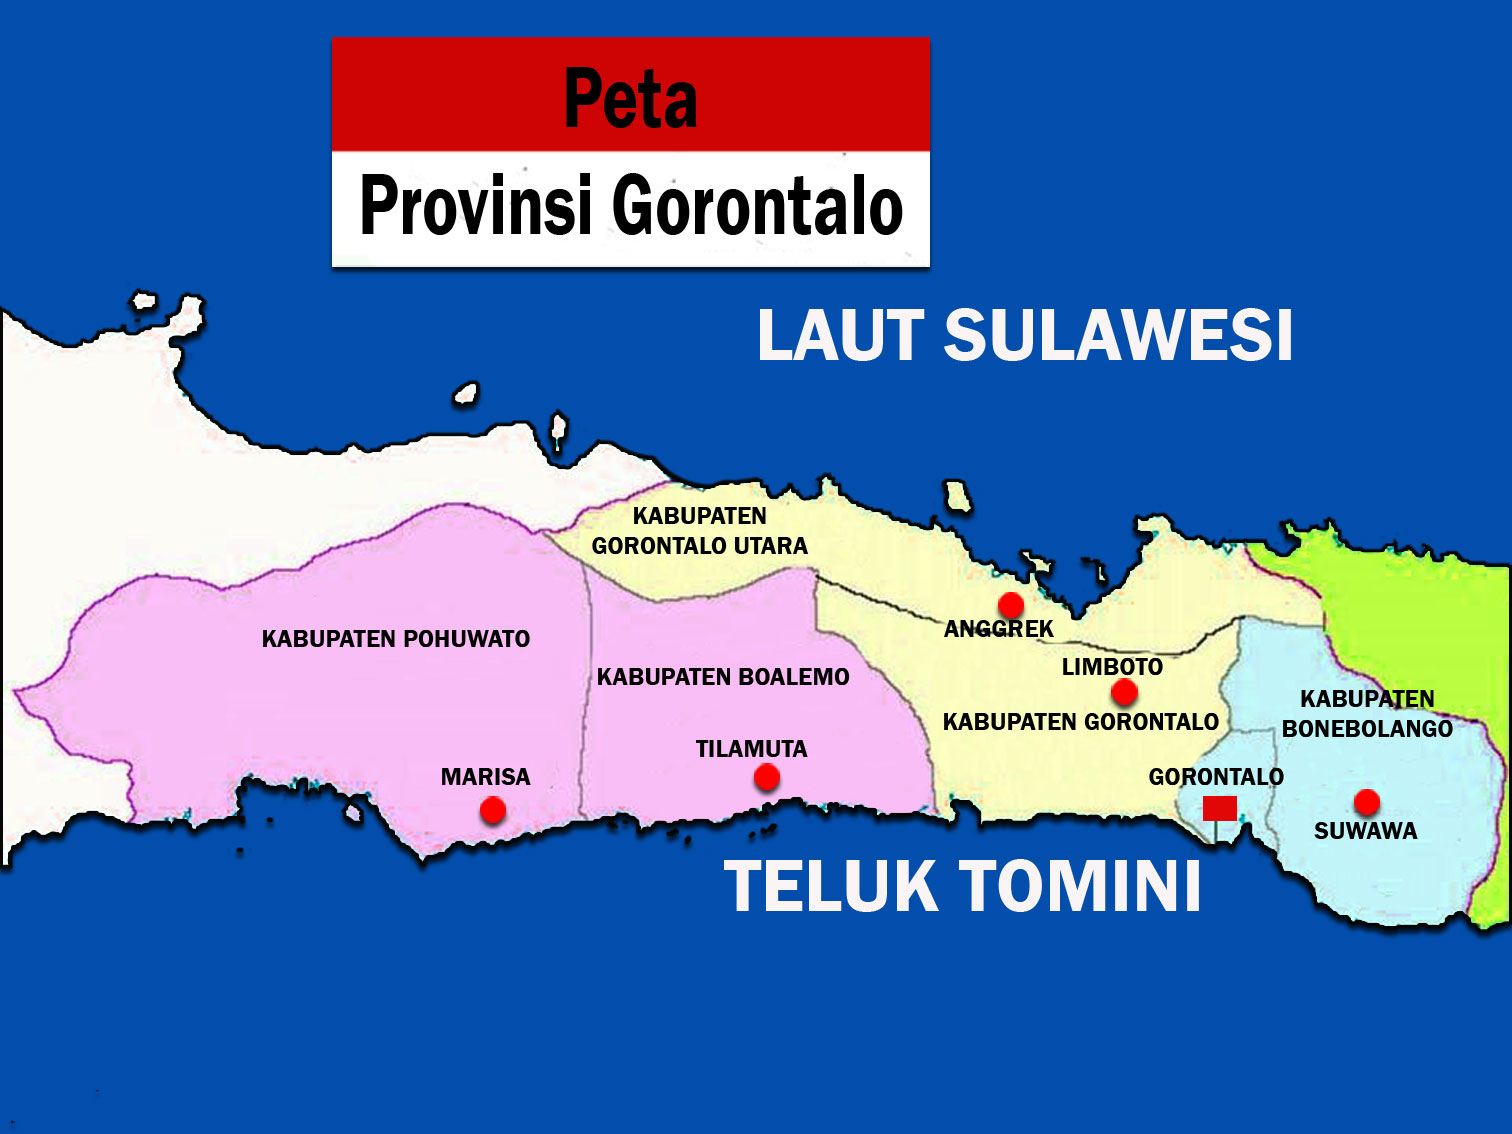 Makna Rumah Adat Minahasa Denah Gambar Daerah Gorontalo Wisata Kab